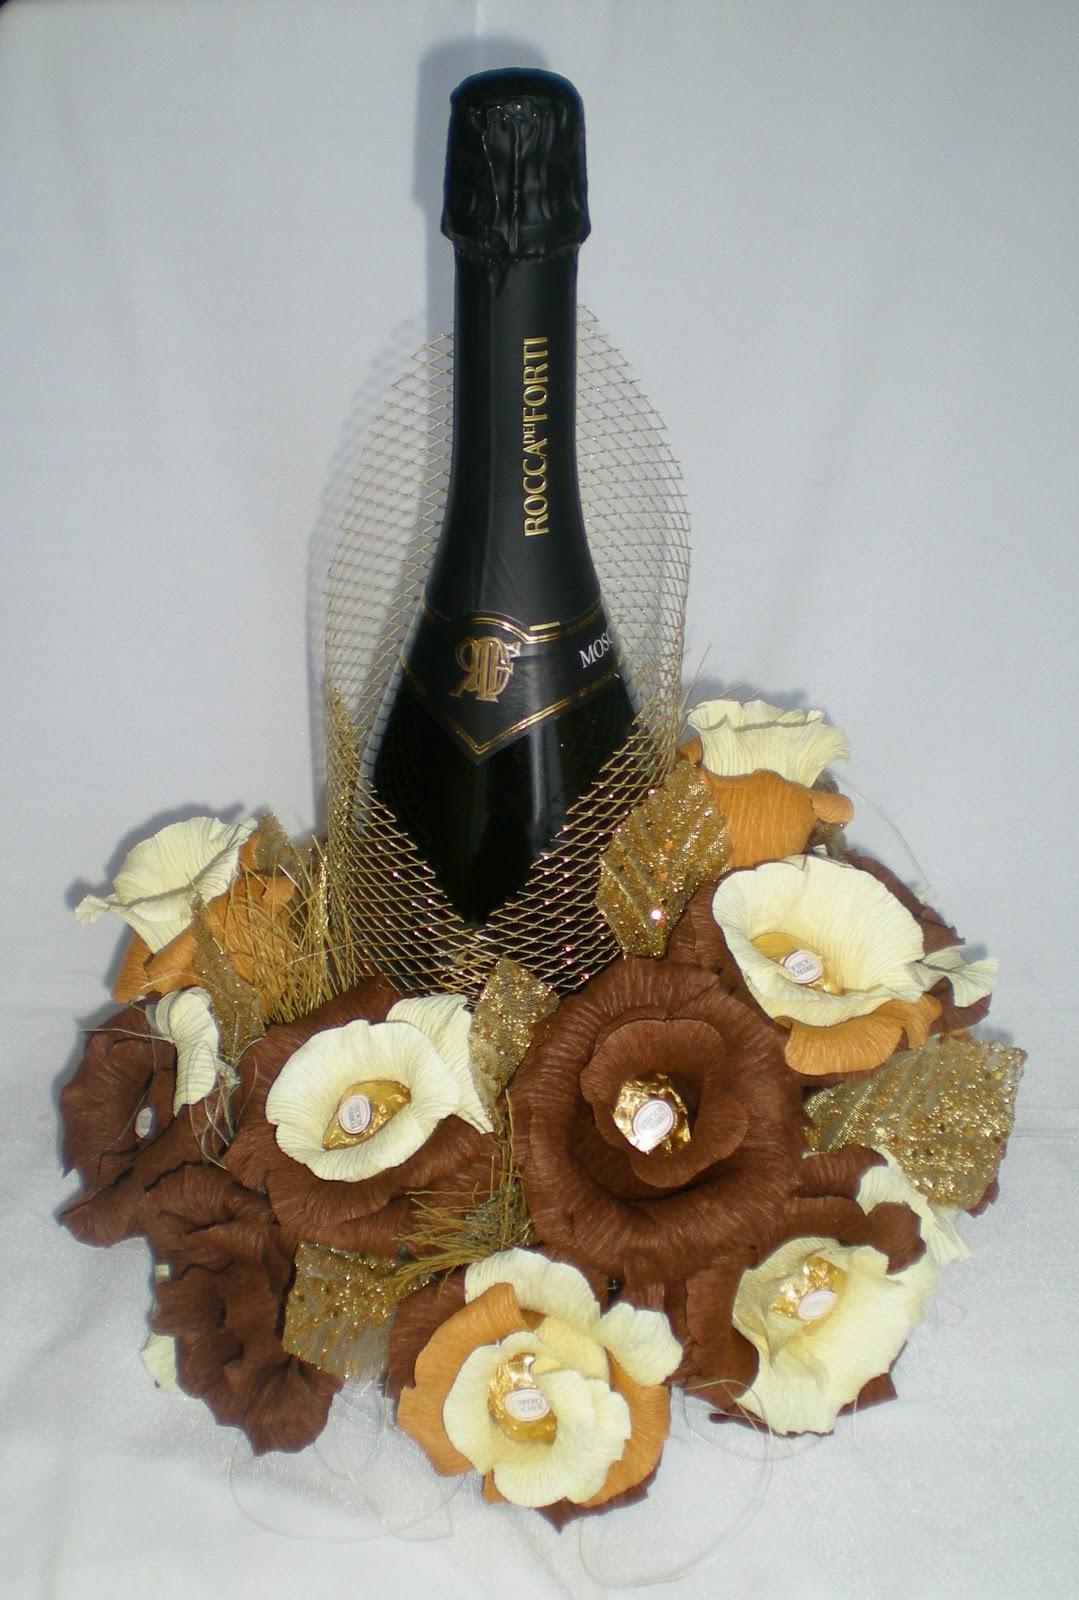 Букеты из конфет, декор бутылок вина и шампанского Olga Malinovskaya 87